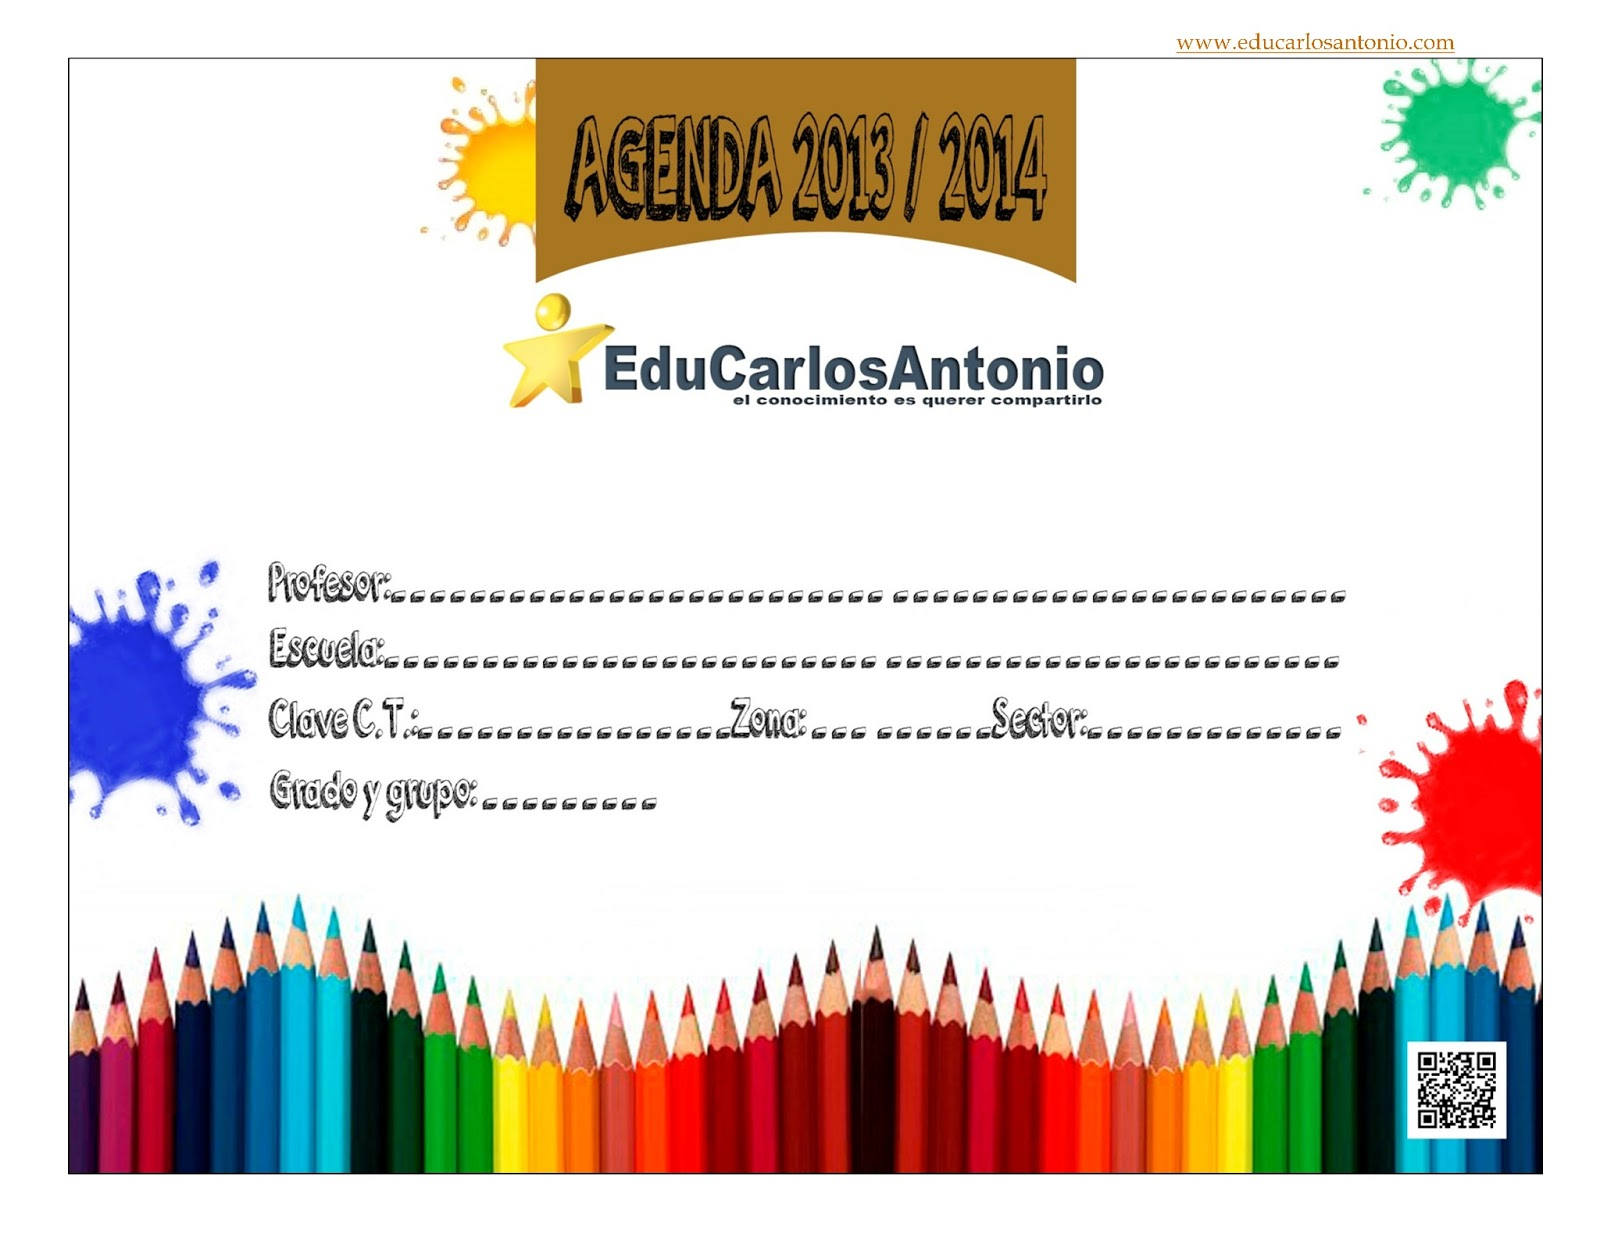 EduCarlosAntonio: Agenda escolar 2013-2014